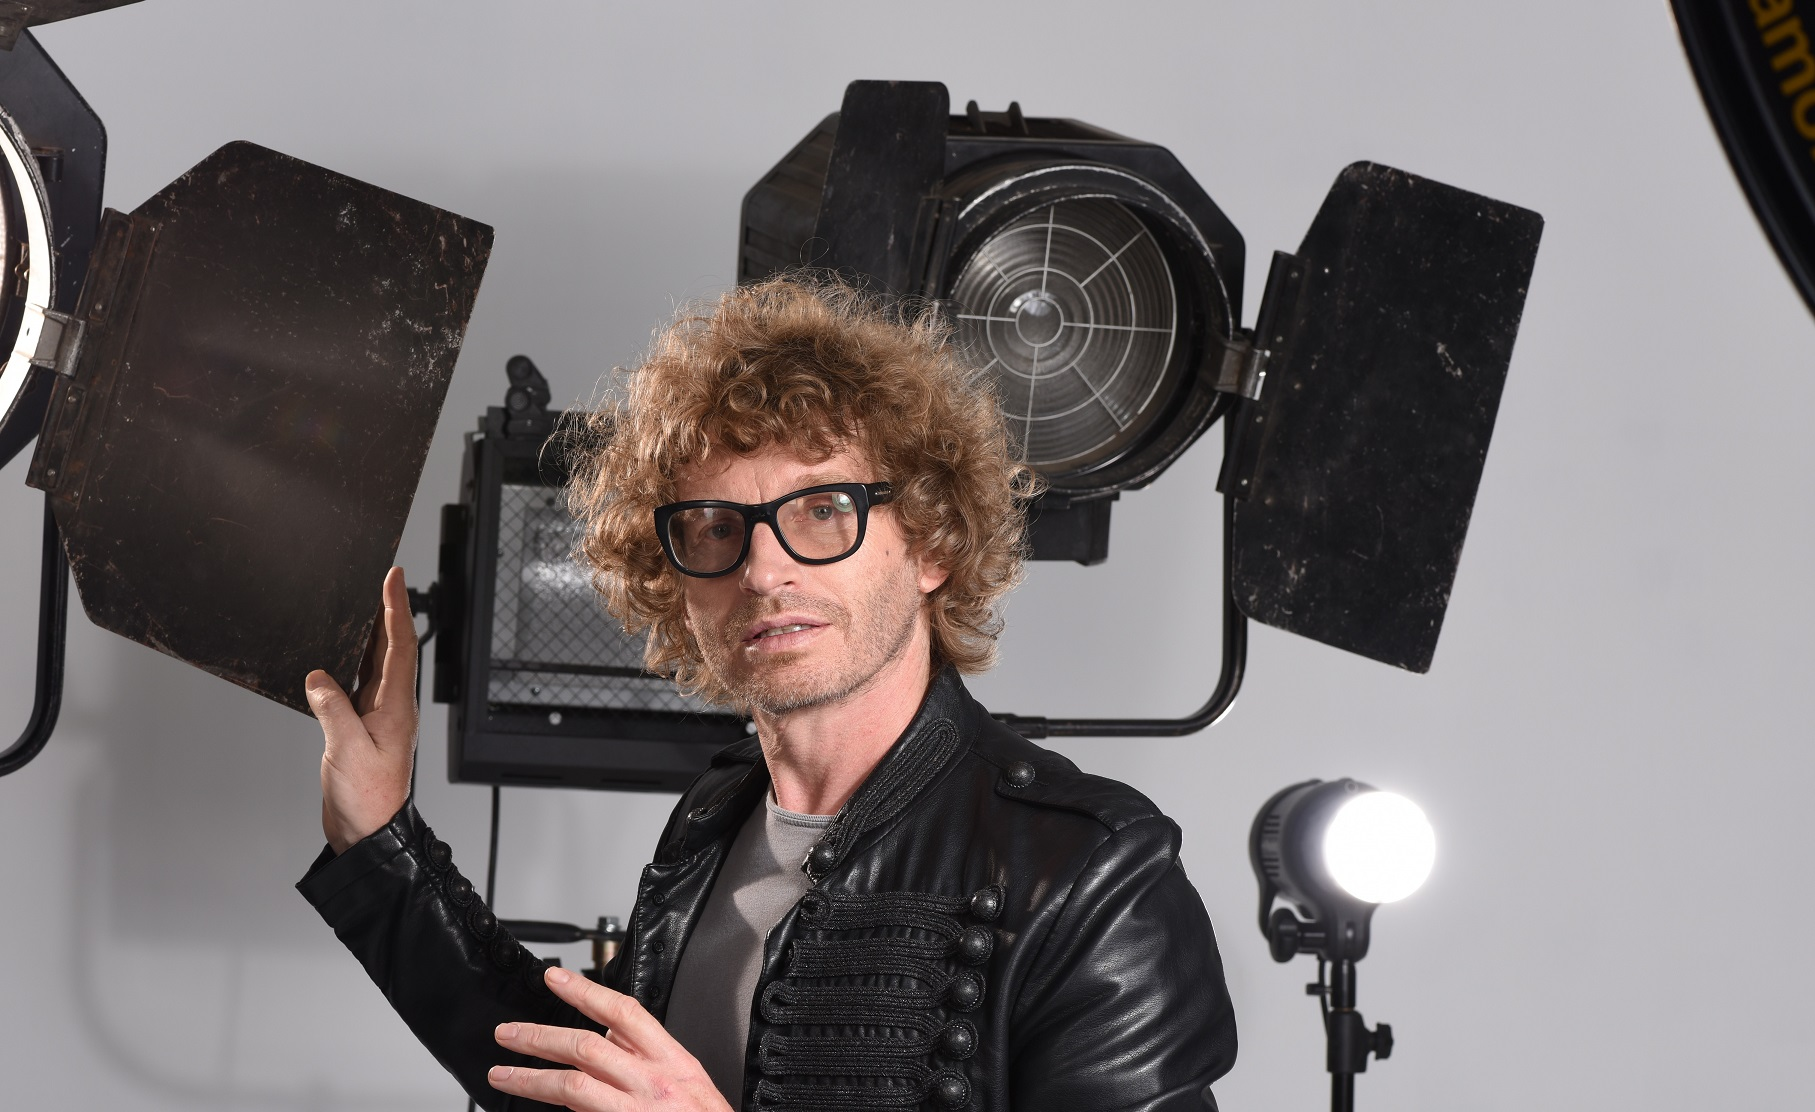 Oleg zotov photographer максим черных